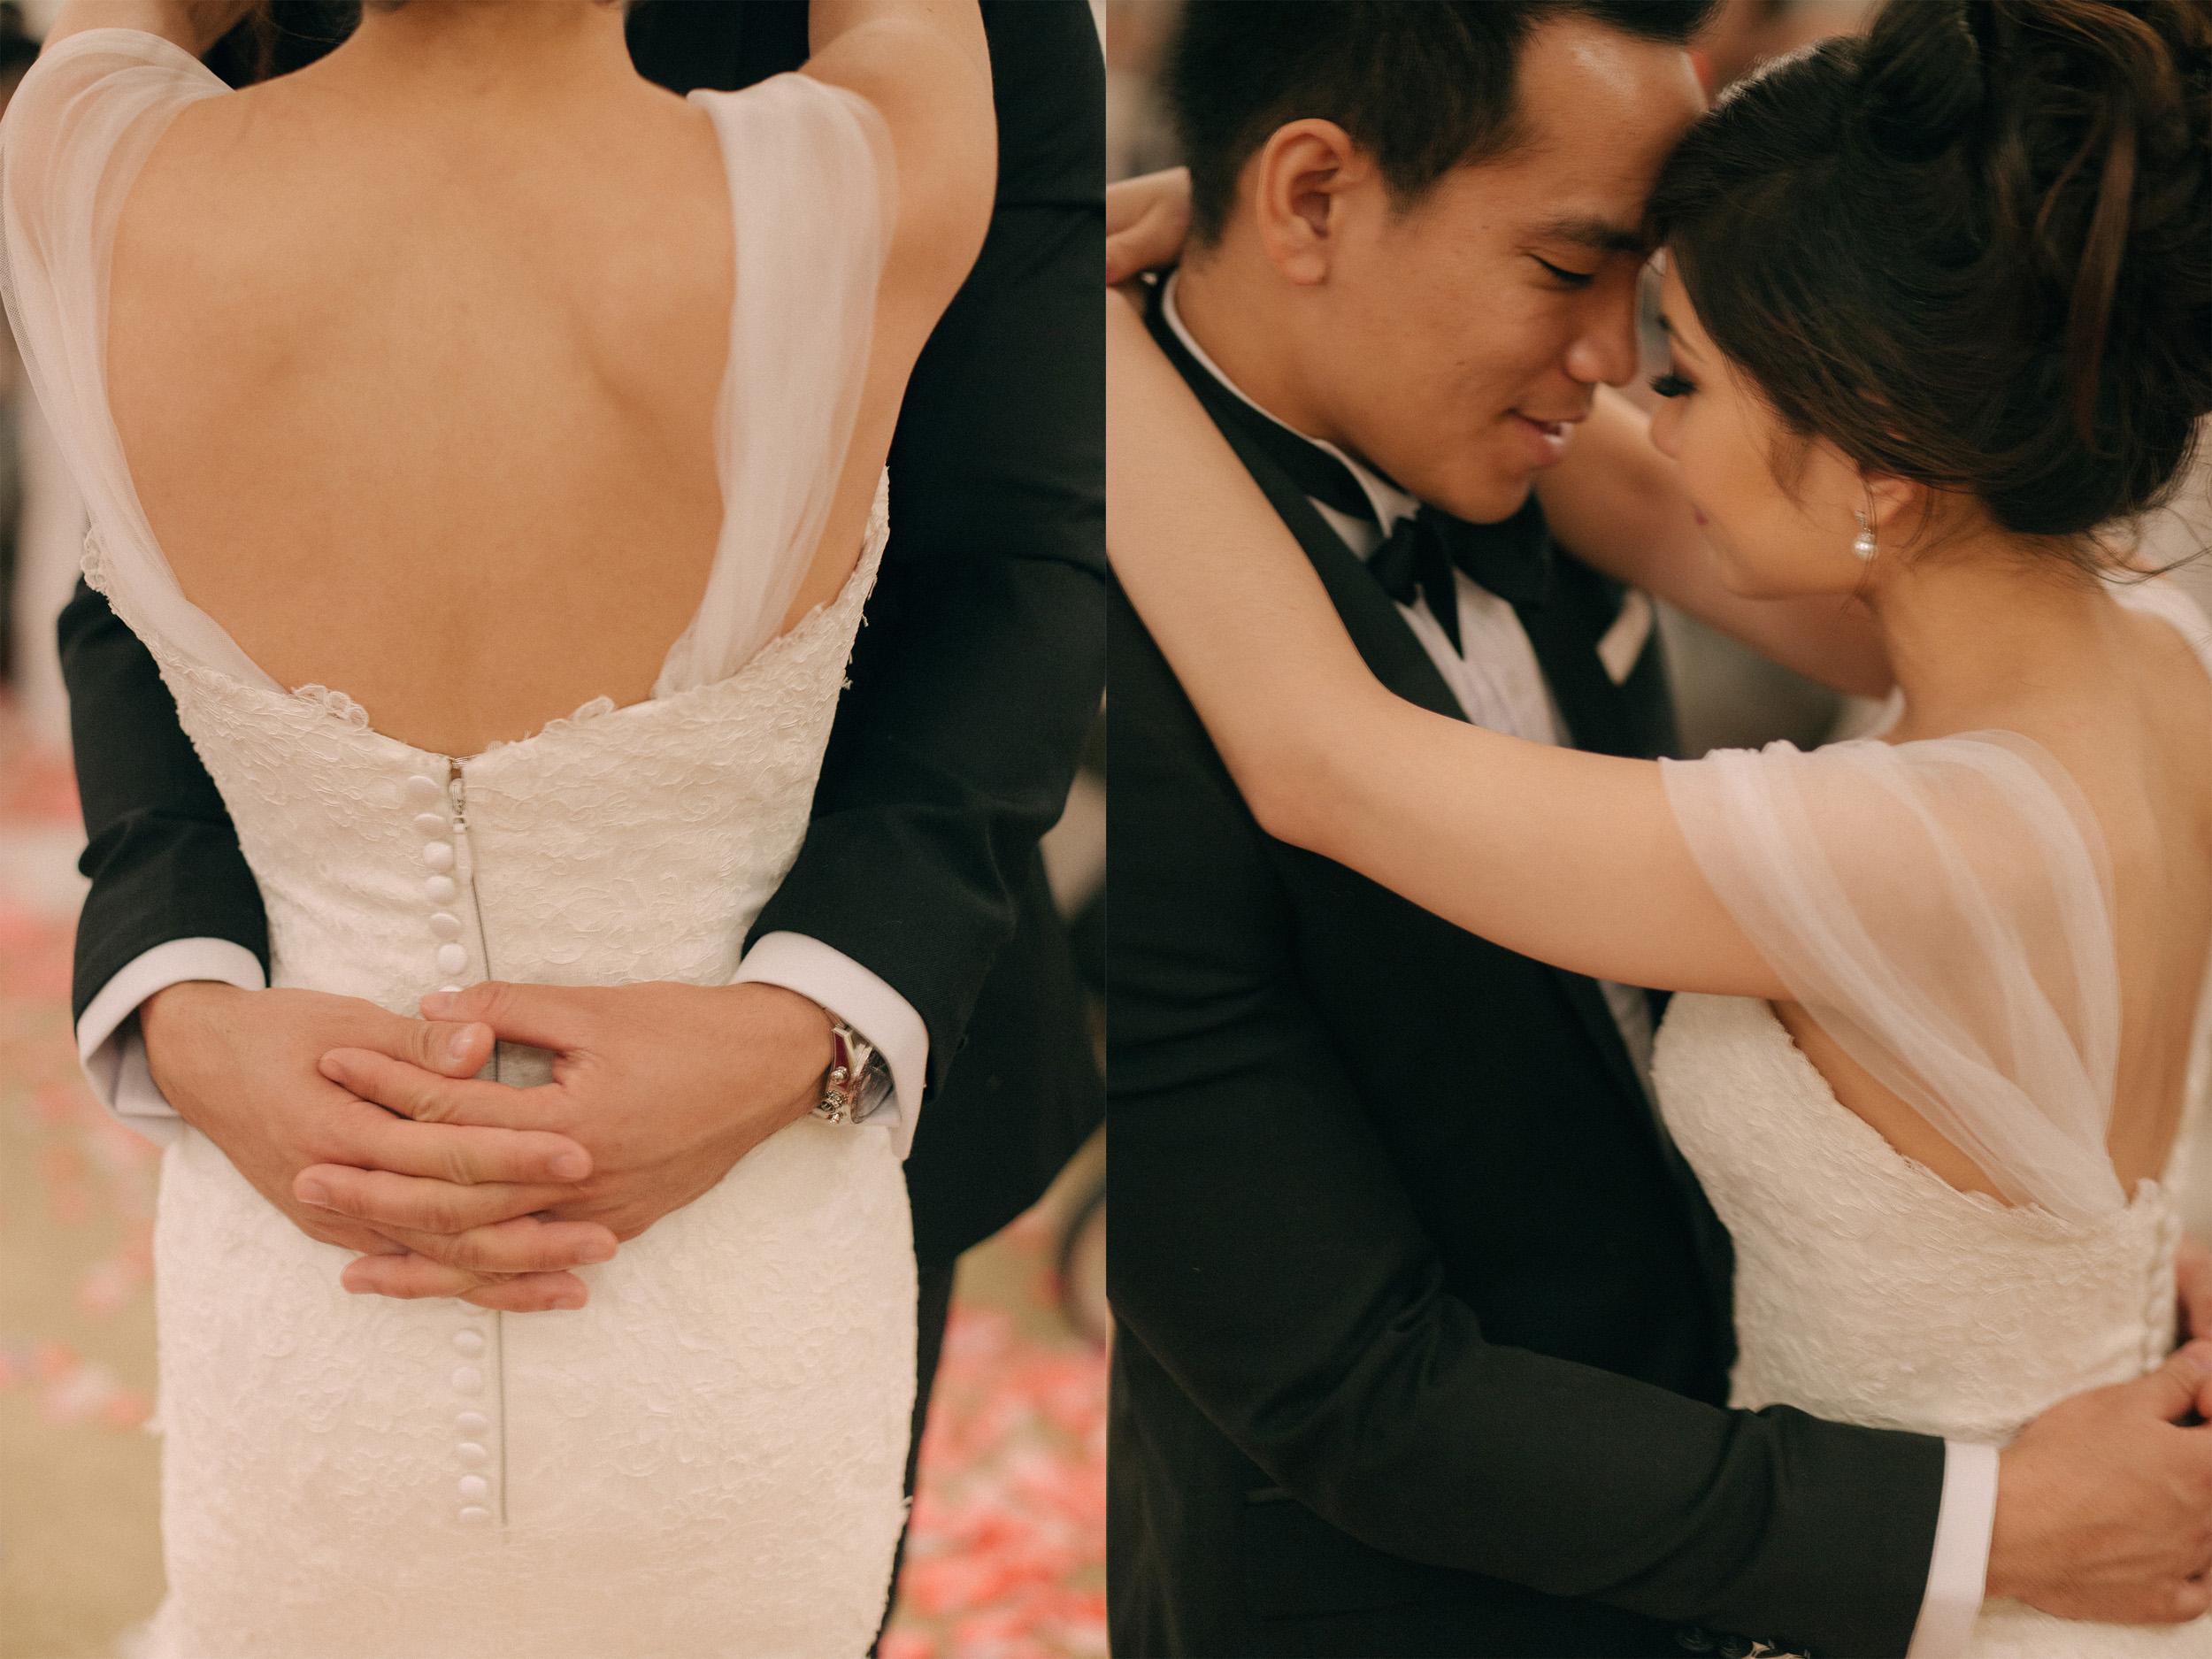 singapore-wedding-photographer-photography-wmt2017-105.jpg